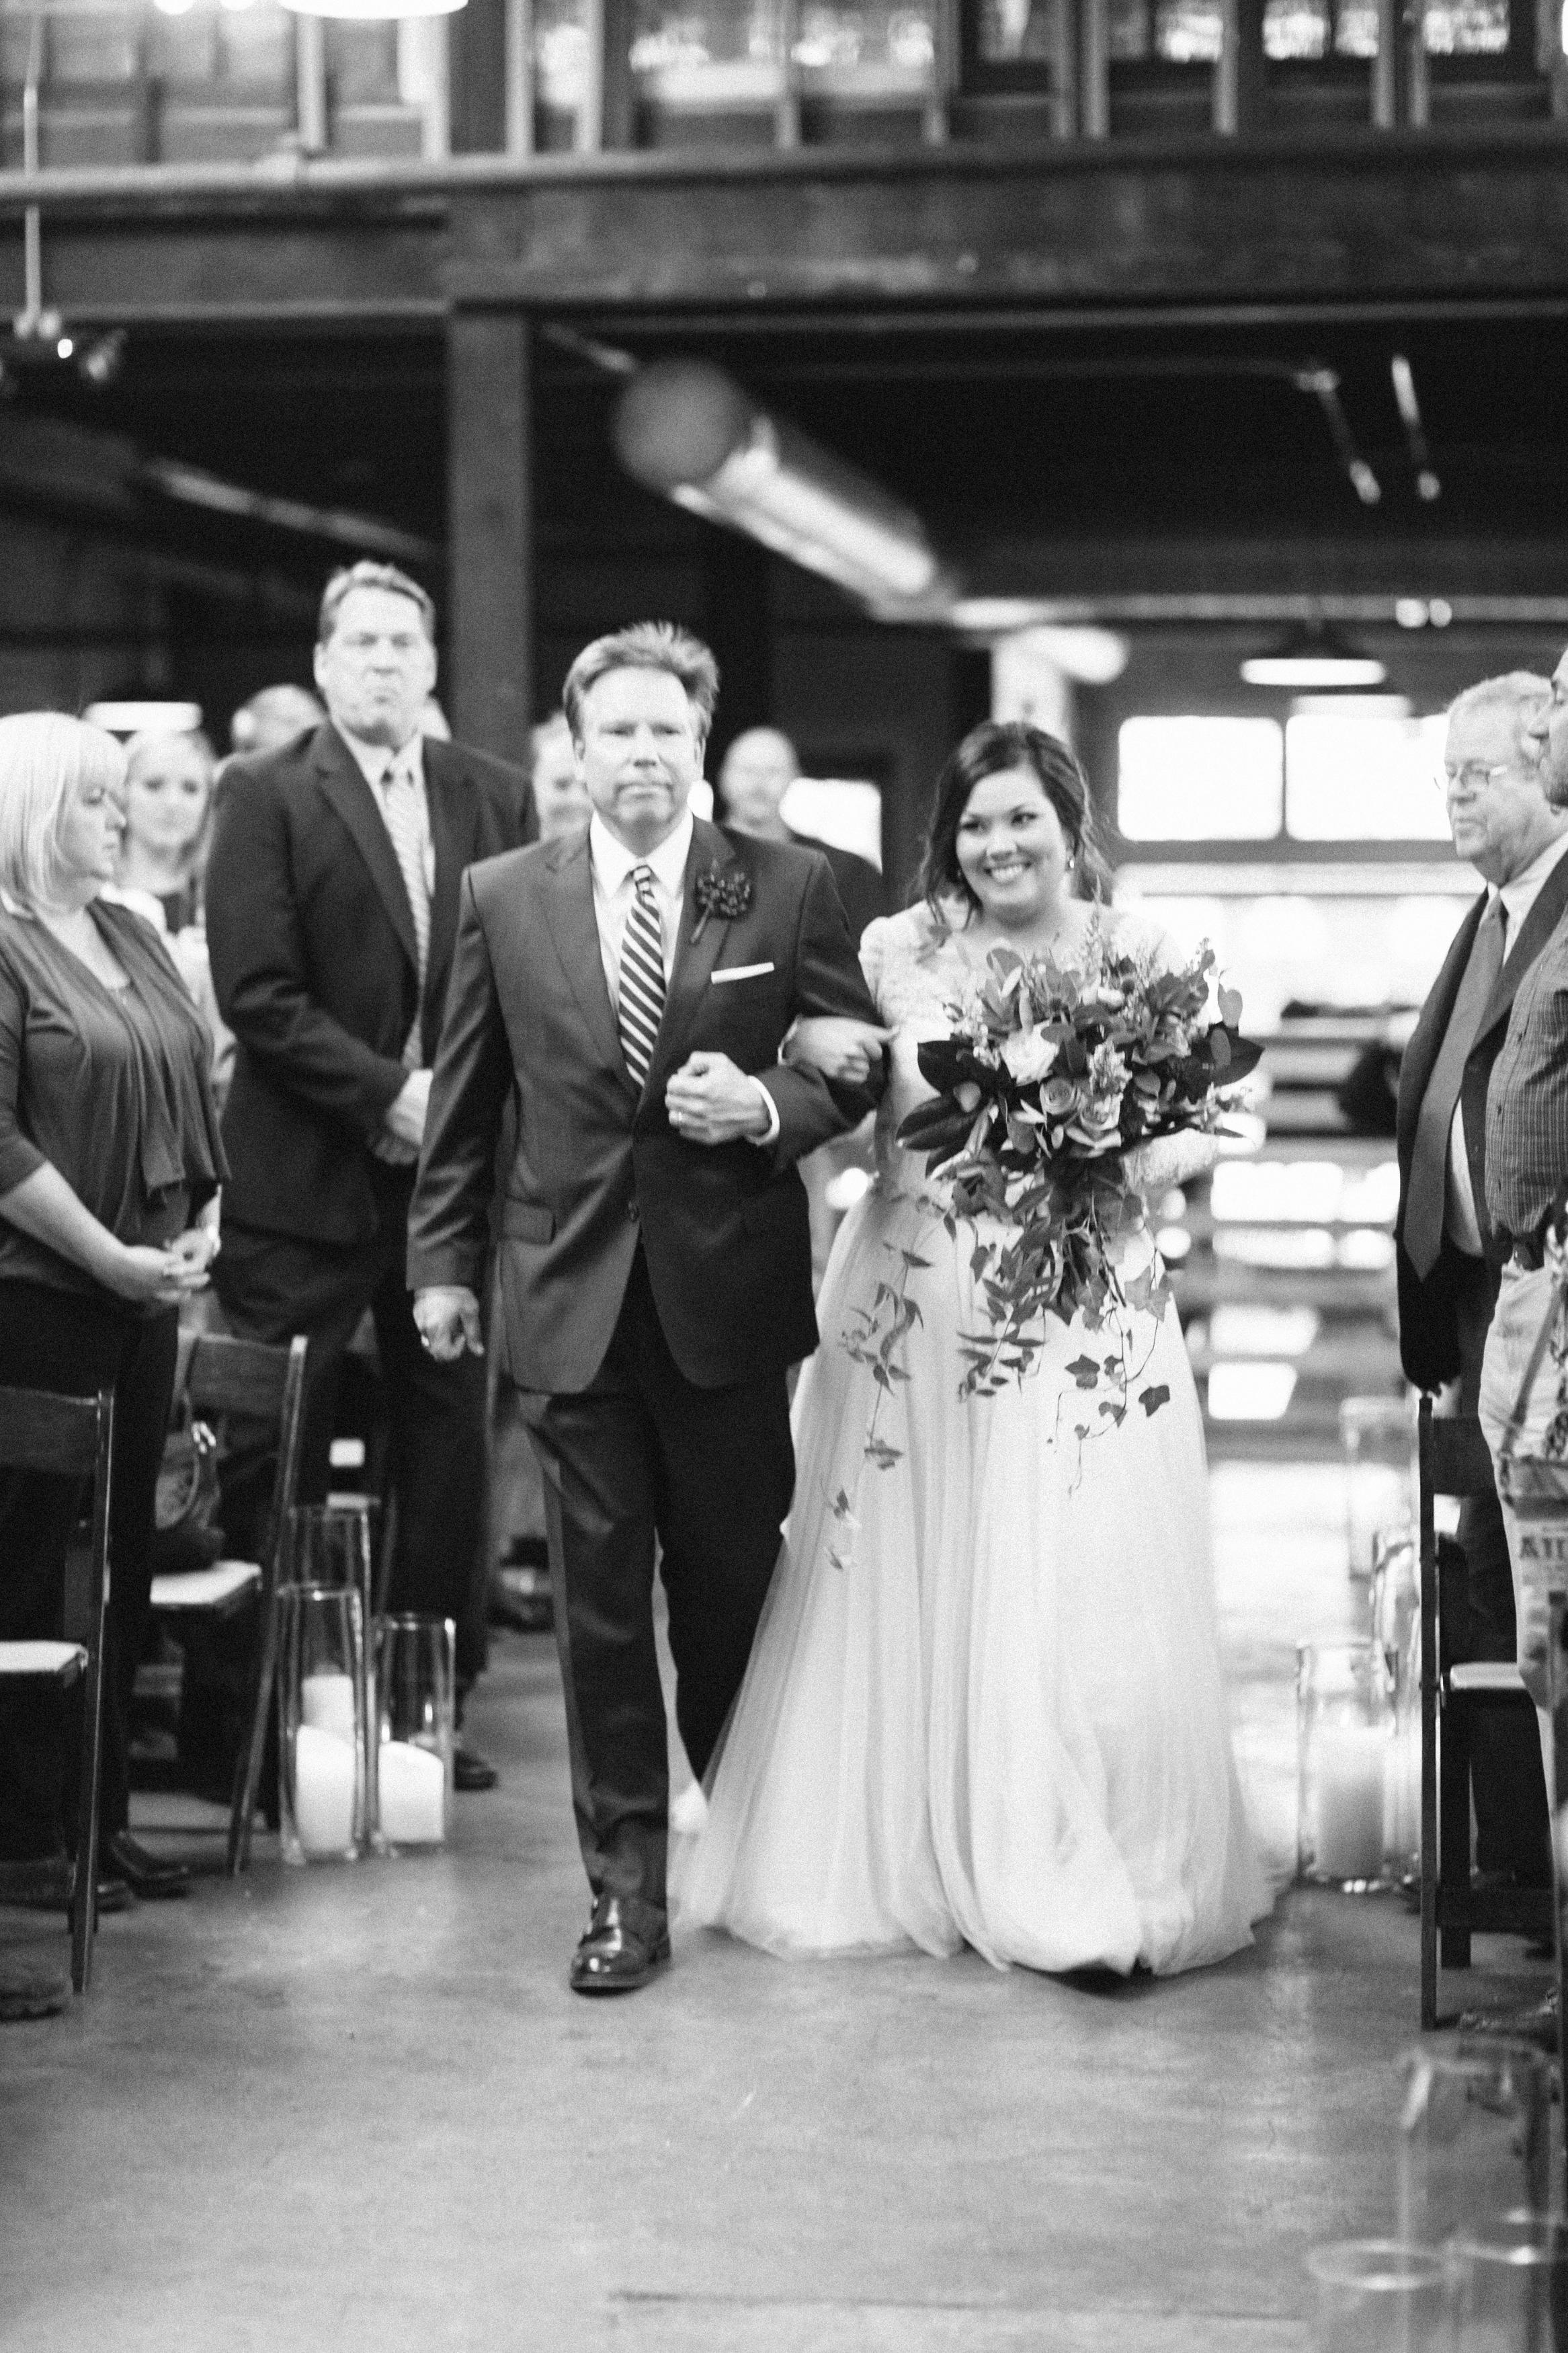 Lauren_Jeremy_Standard_Wedding_Knoxville_Abigail_Malone_Photography_FIlm-463.jpg